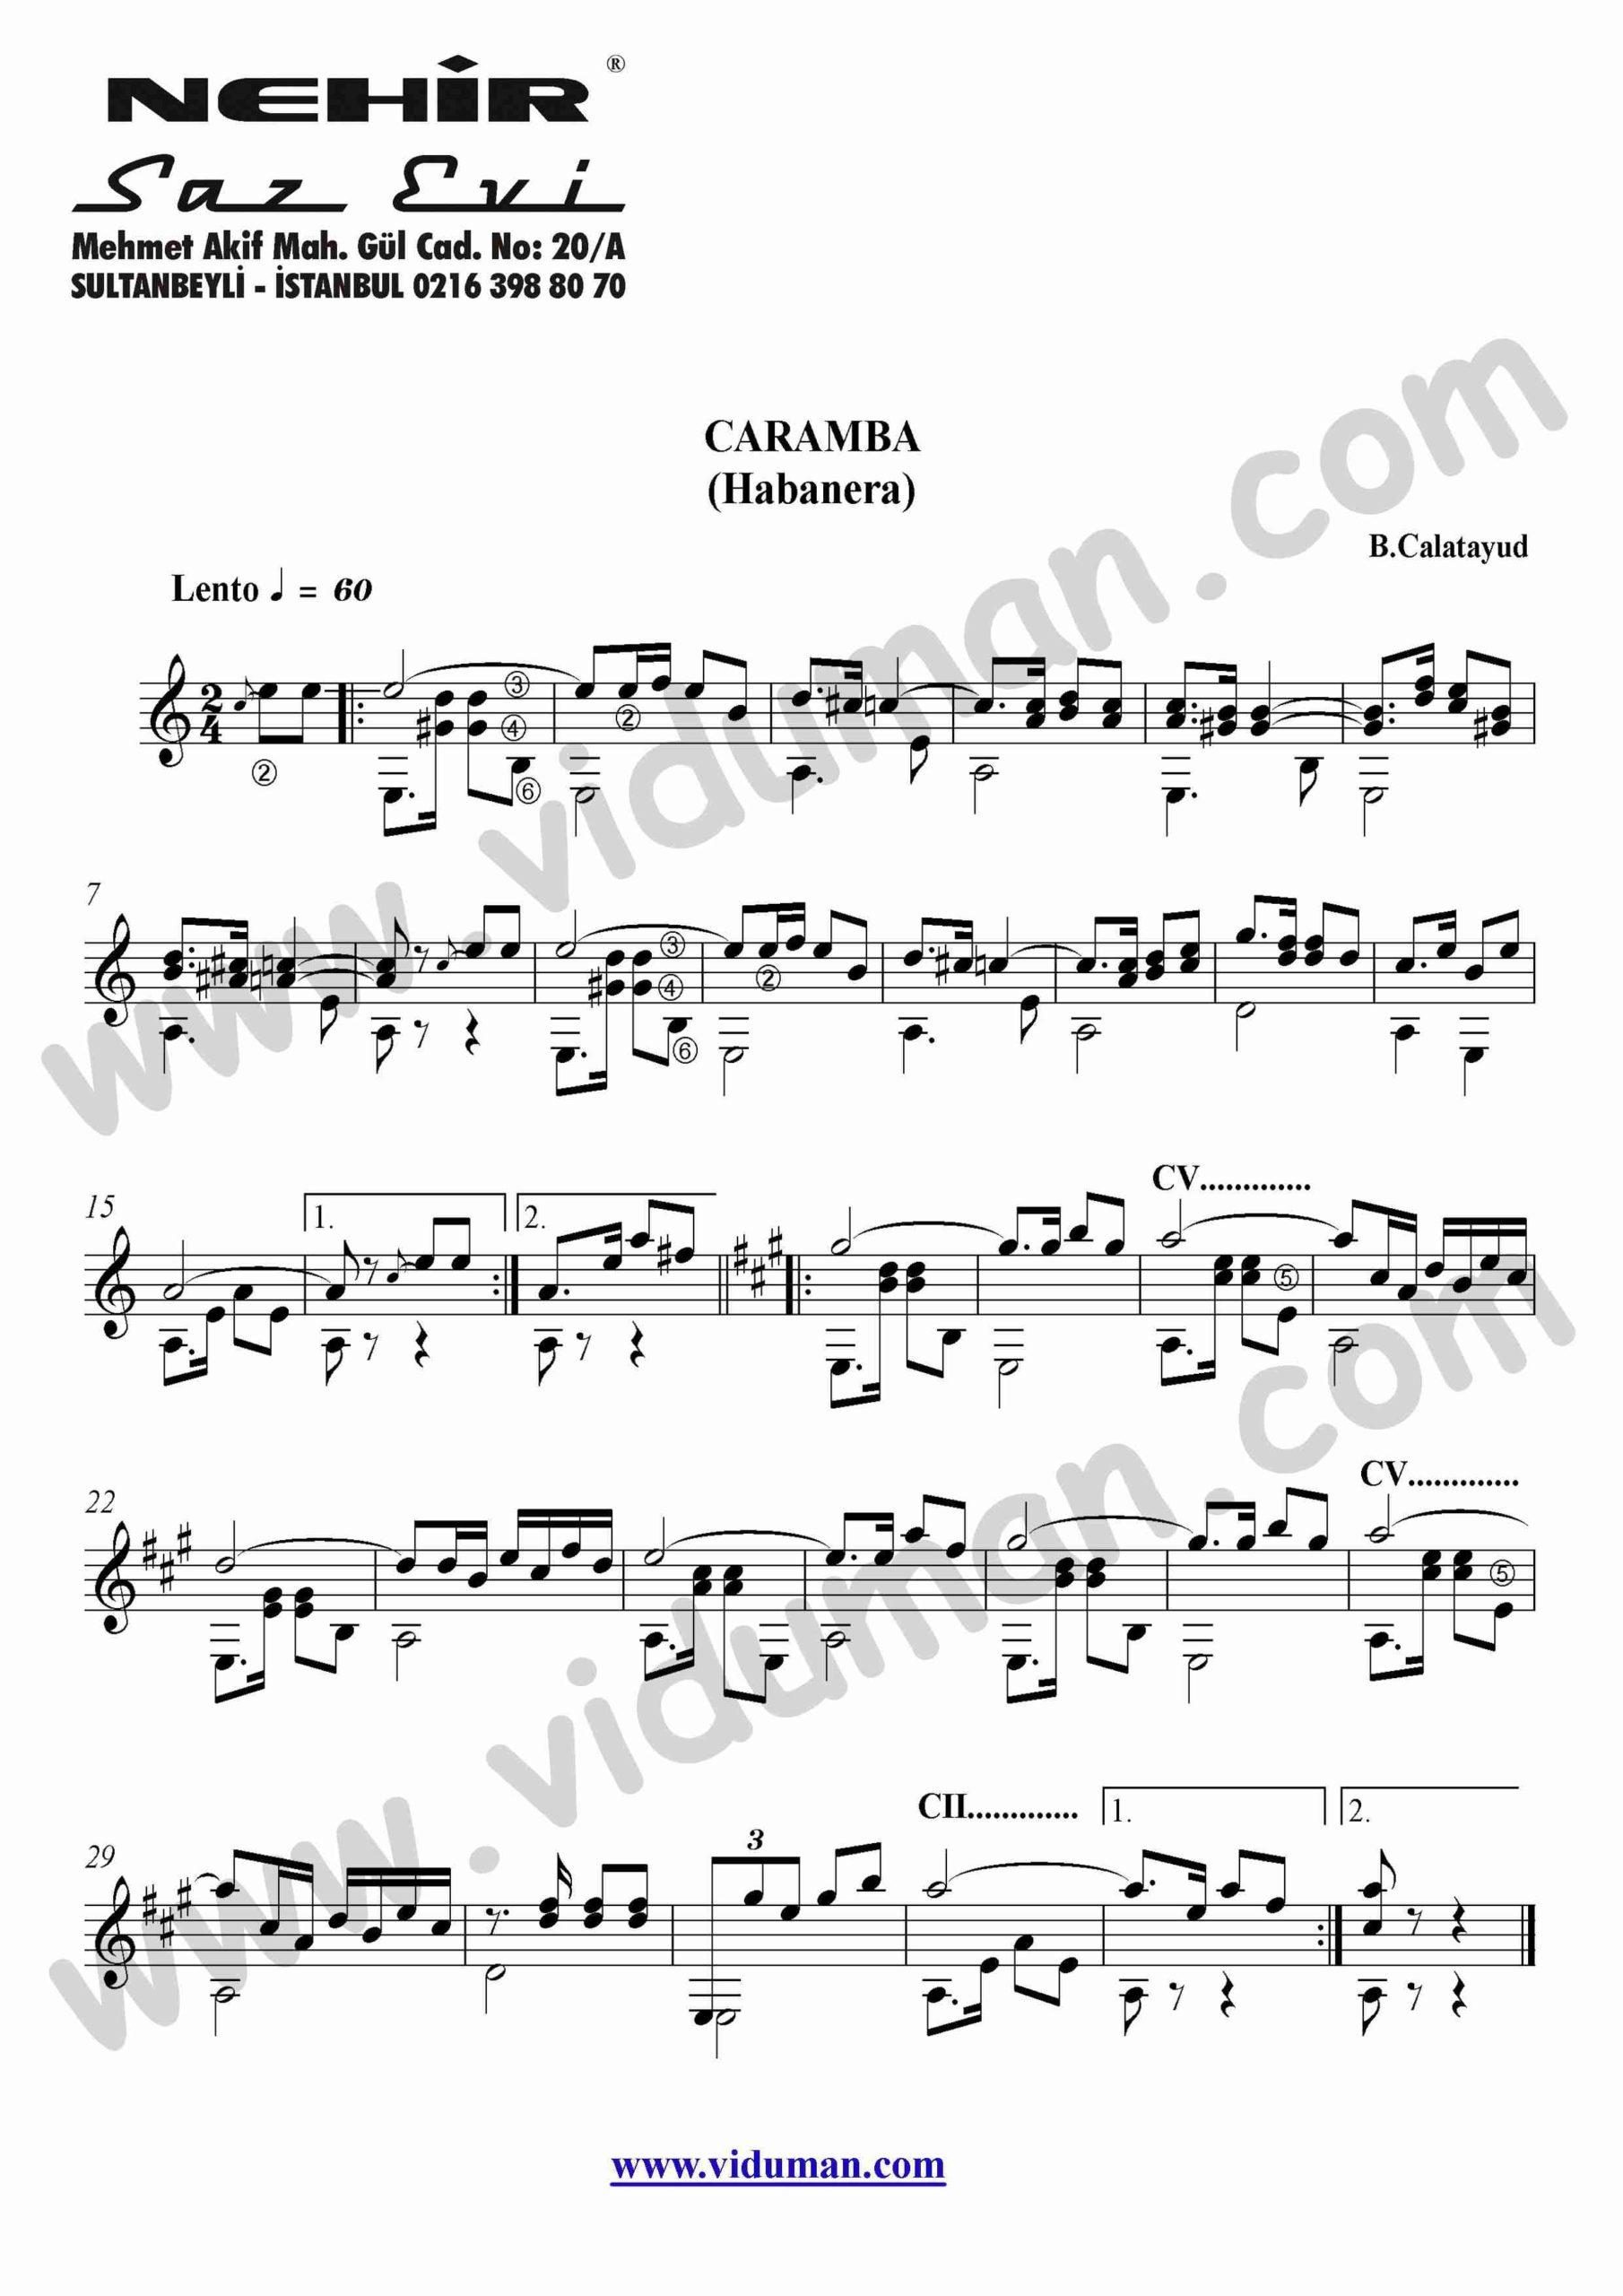 79- Caramba-Habanera (B.Calatayud)